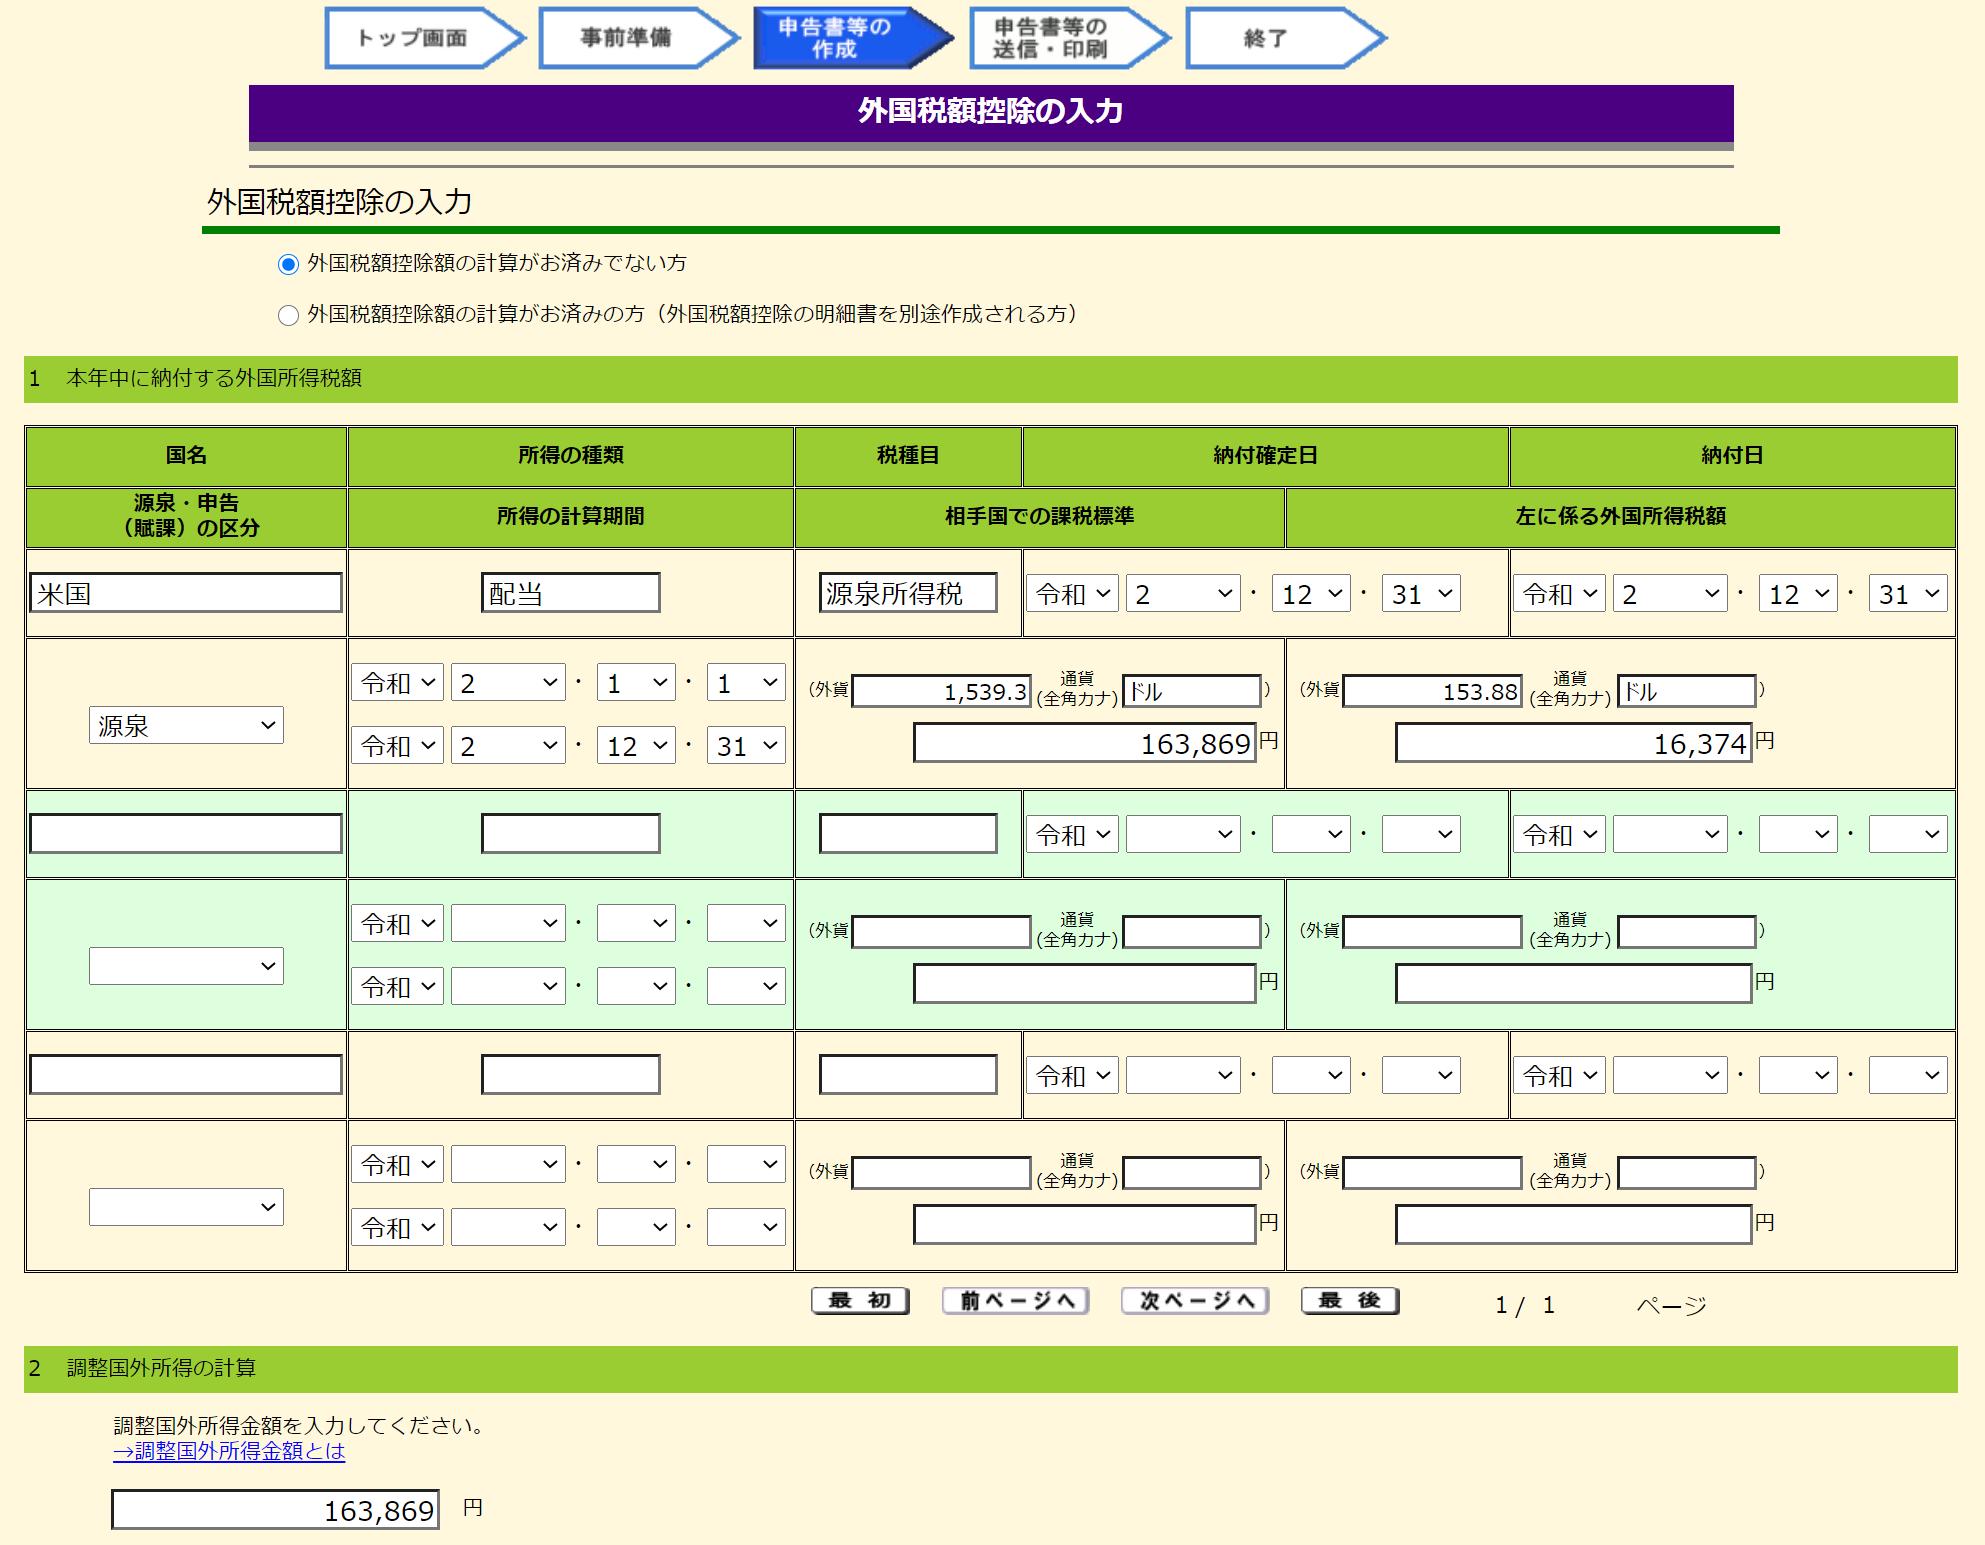 f:id:hodo-work:20210127195320p:plain